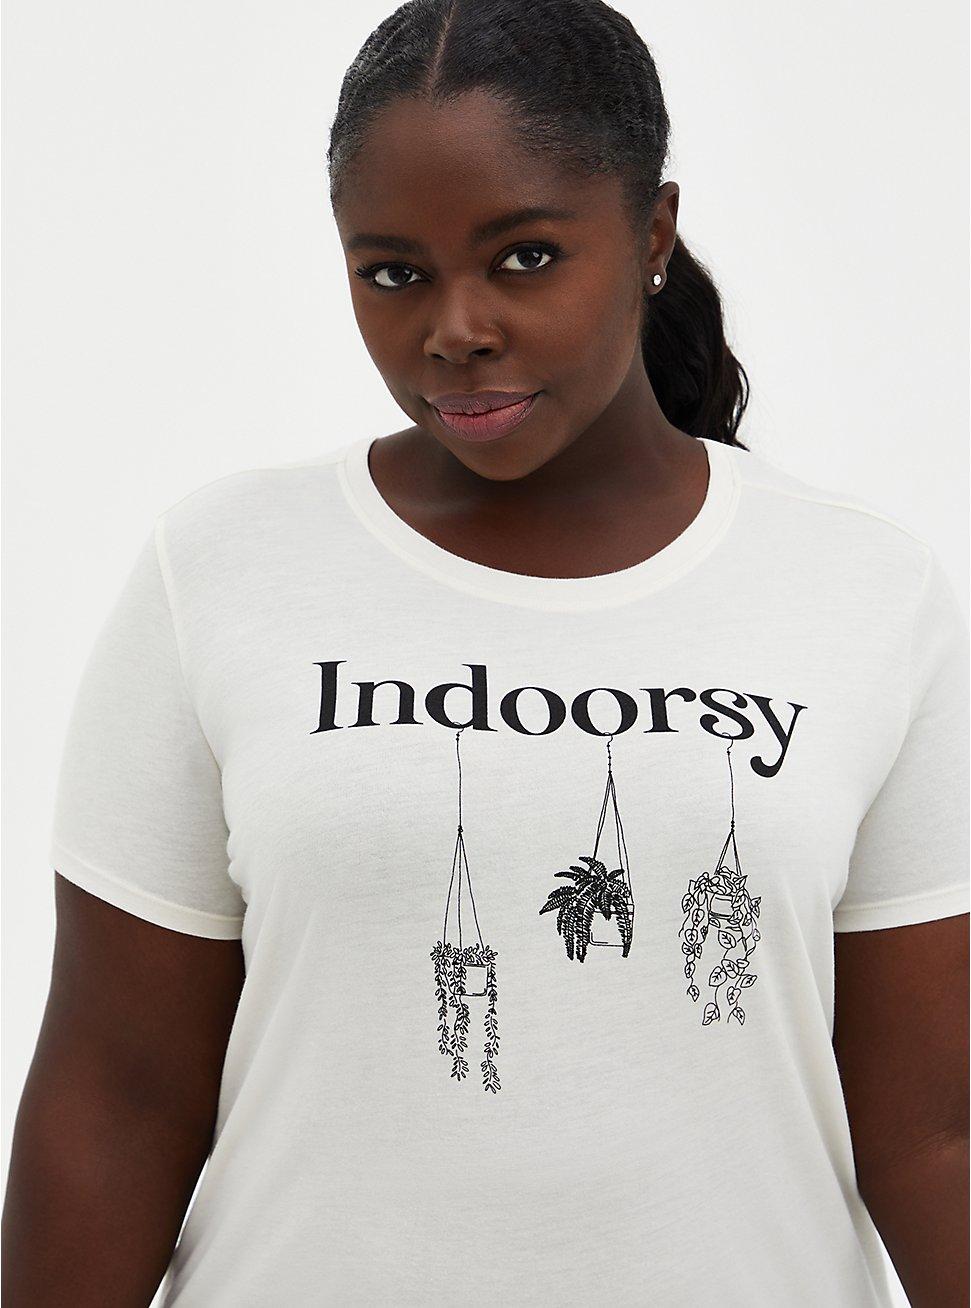 Indoorsy Crew Tee - Ivory, , hi-res